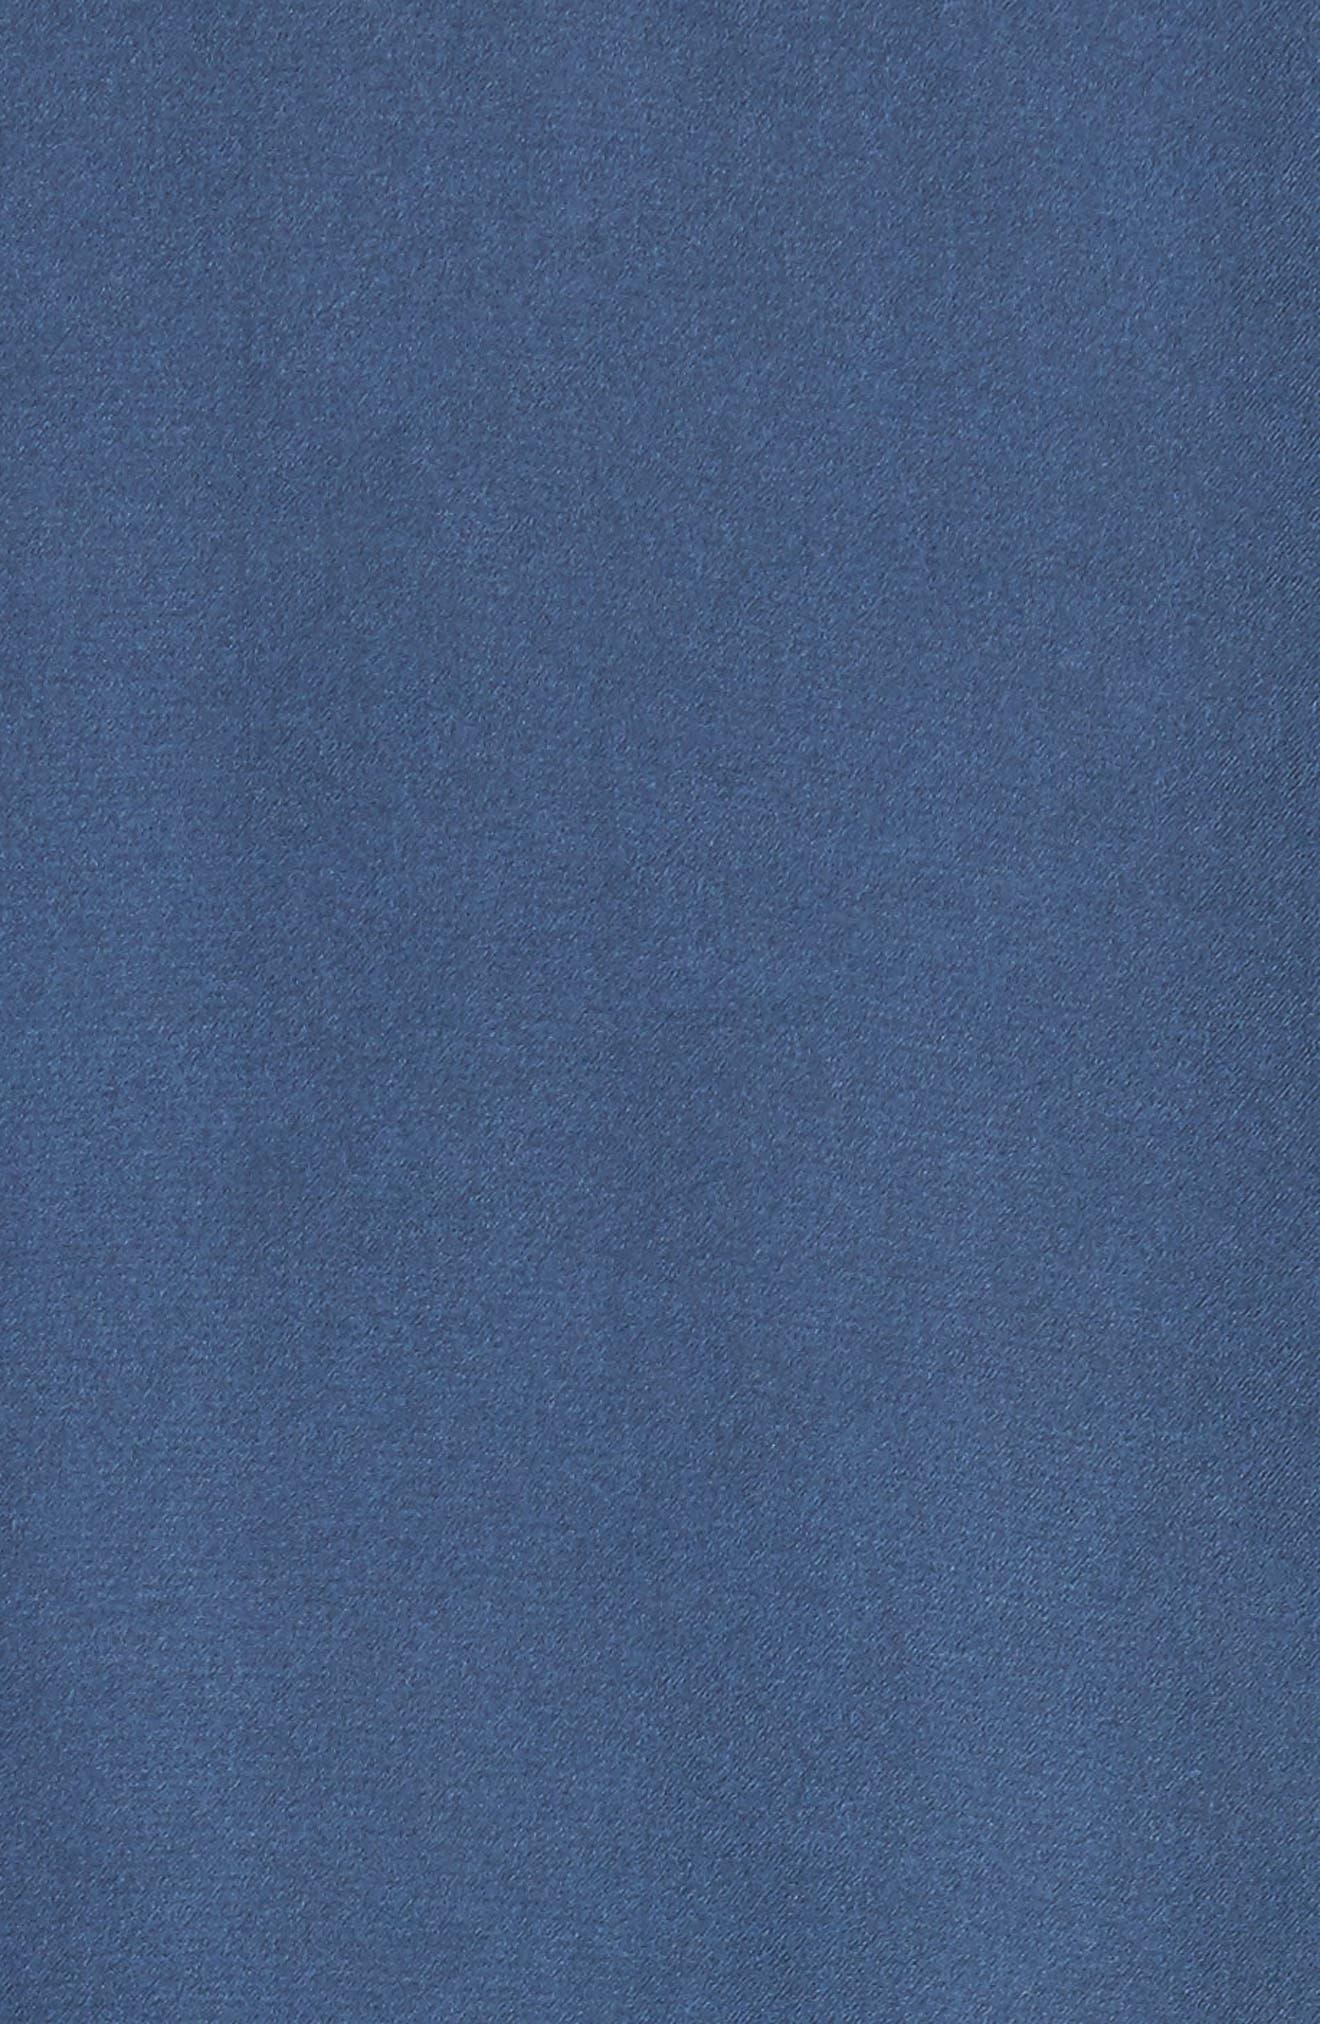 Satin Souvenir Bomber Jacket,                             Alternate thumbnail 6, color,                             400